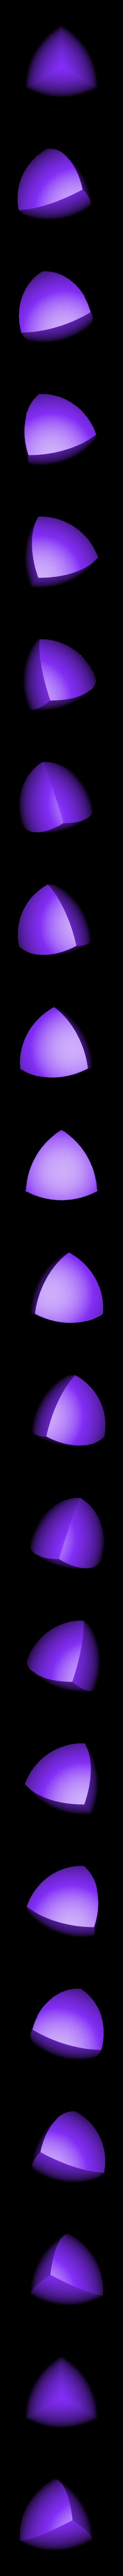 TetrahedronalBall.stl Download free STL file Solids/Surfaces of Constant Width, Triangular, Pentagonal, Tetrahedronal Balls • 3D printable template, LGBU